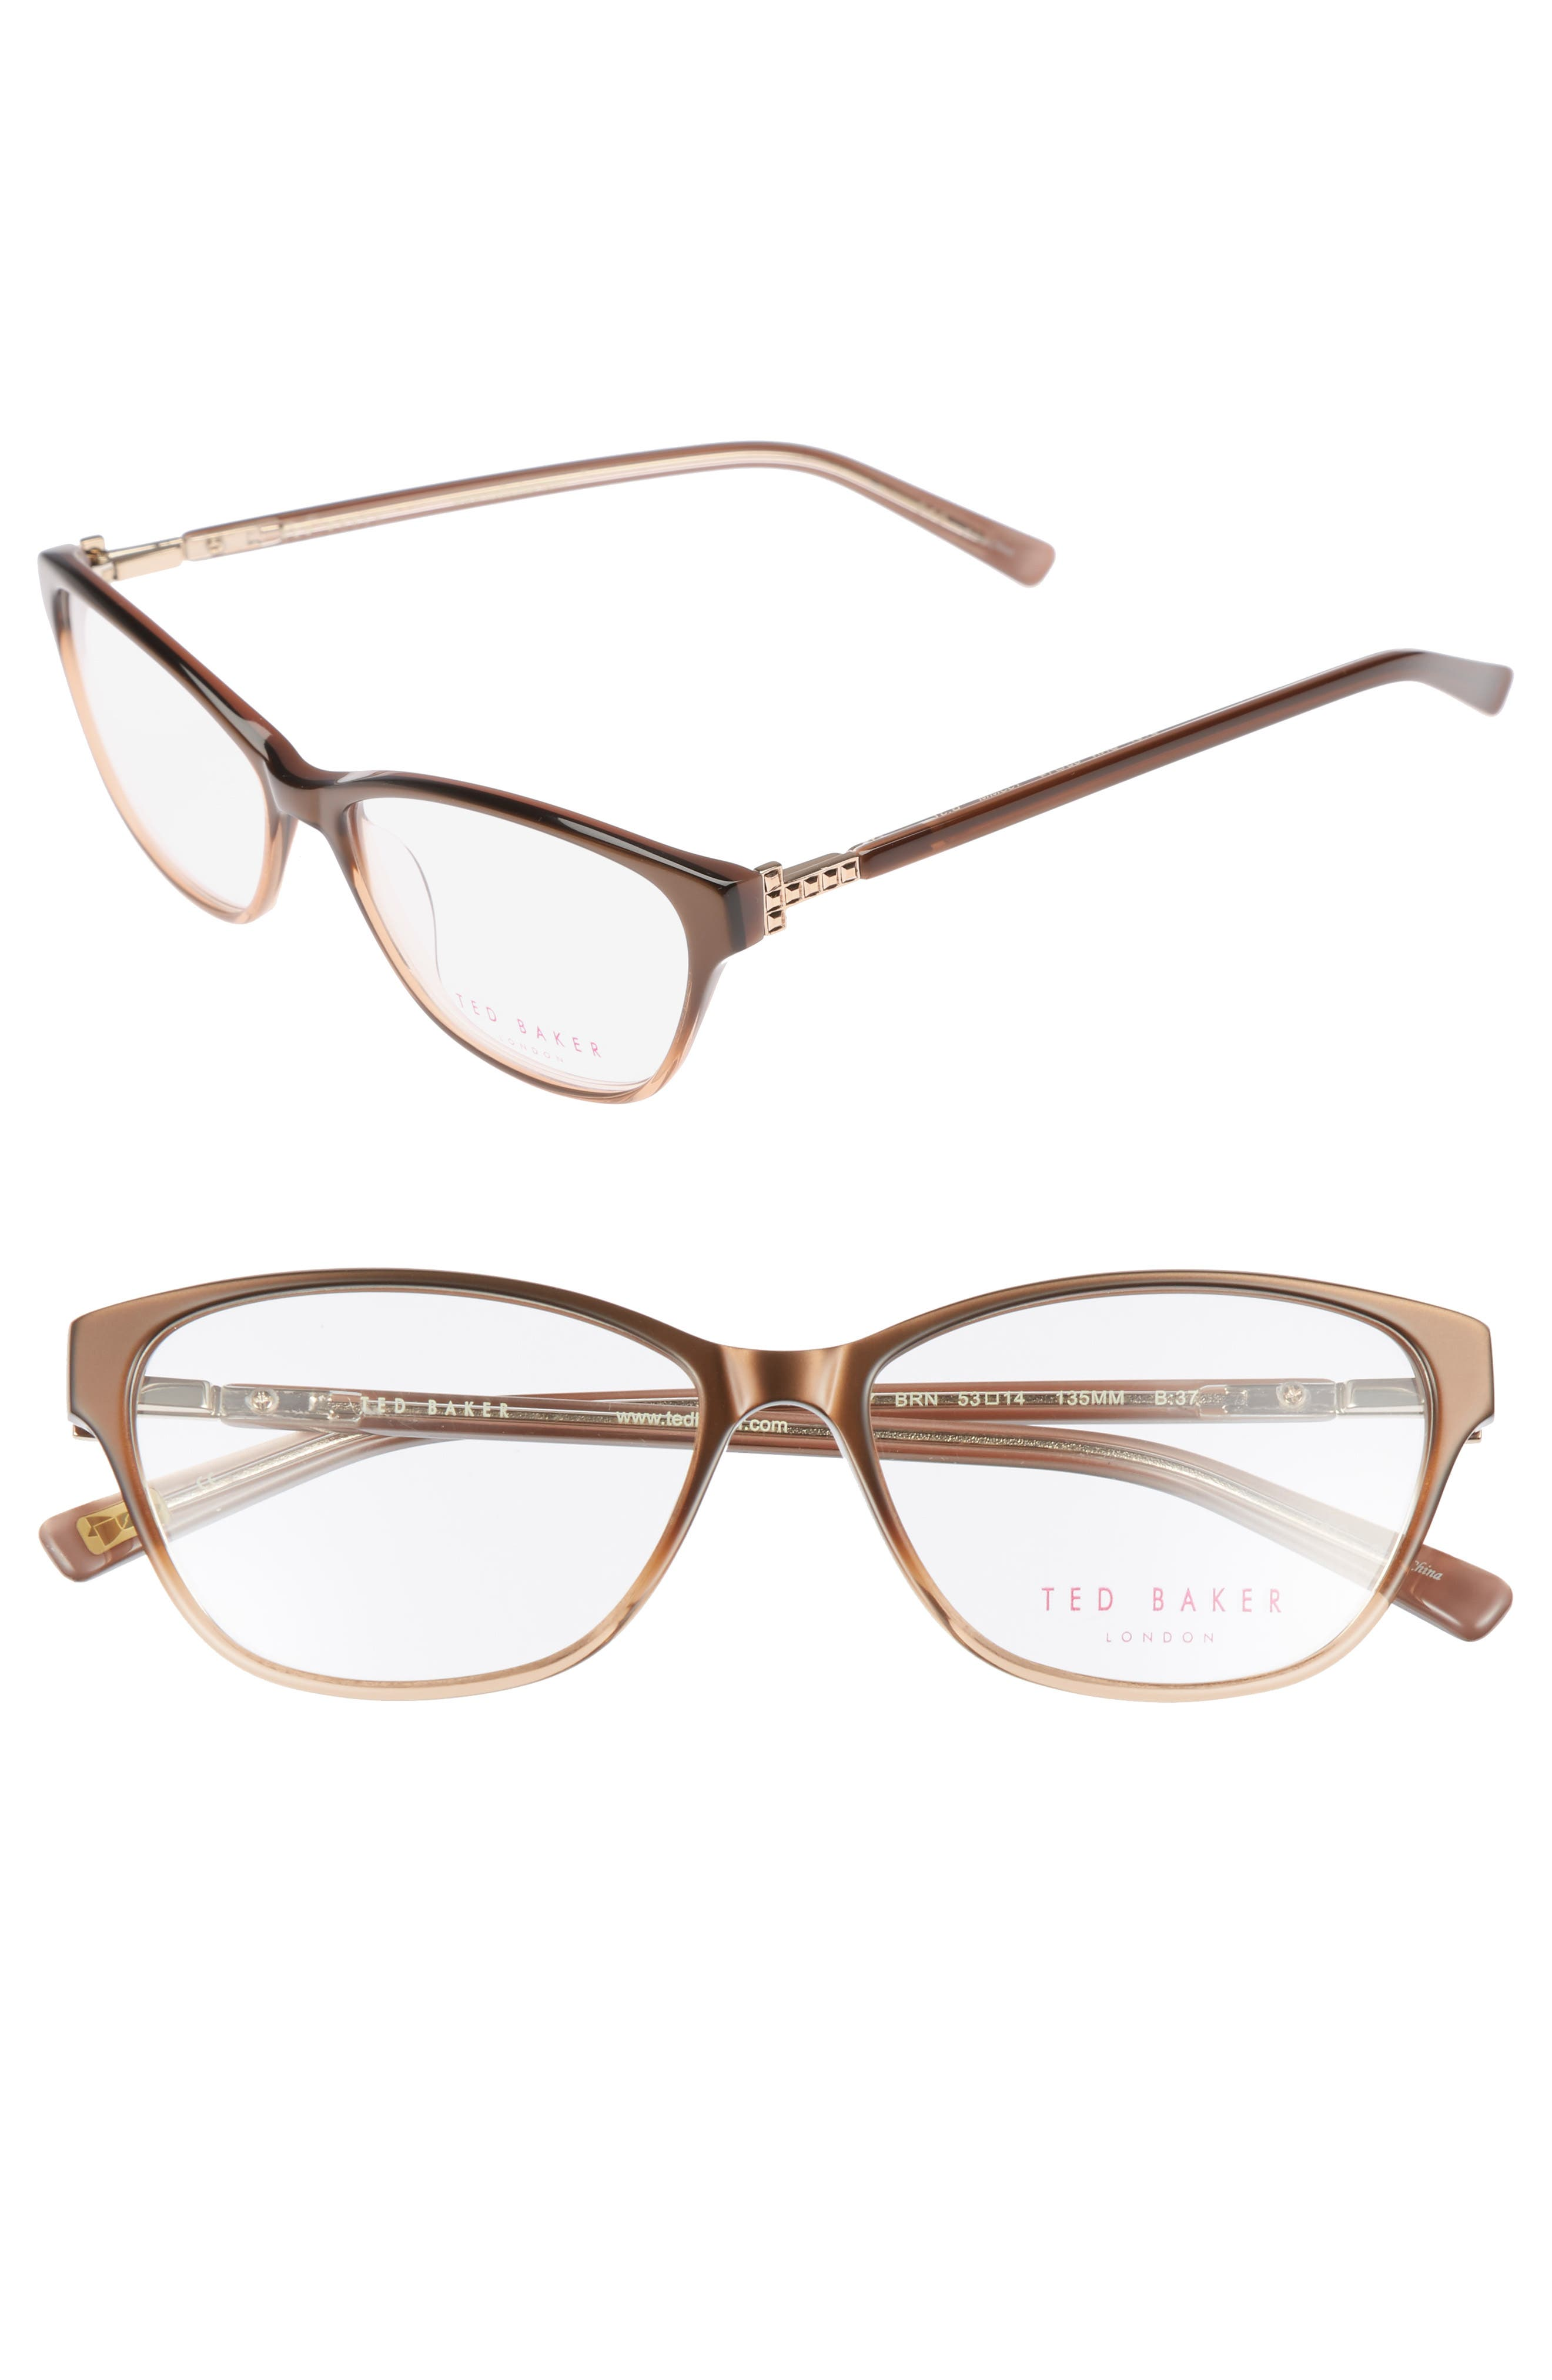 53mm Optical Cat Eye Glasses,                         Main,                         color,